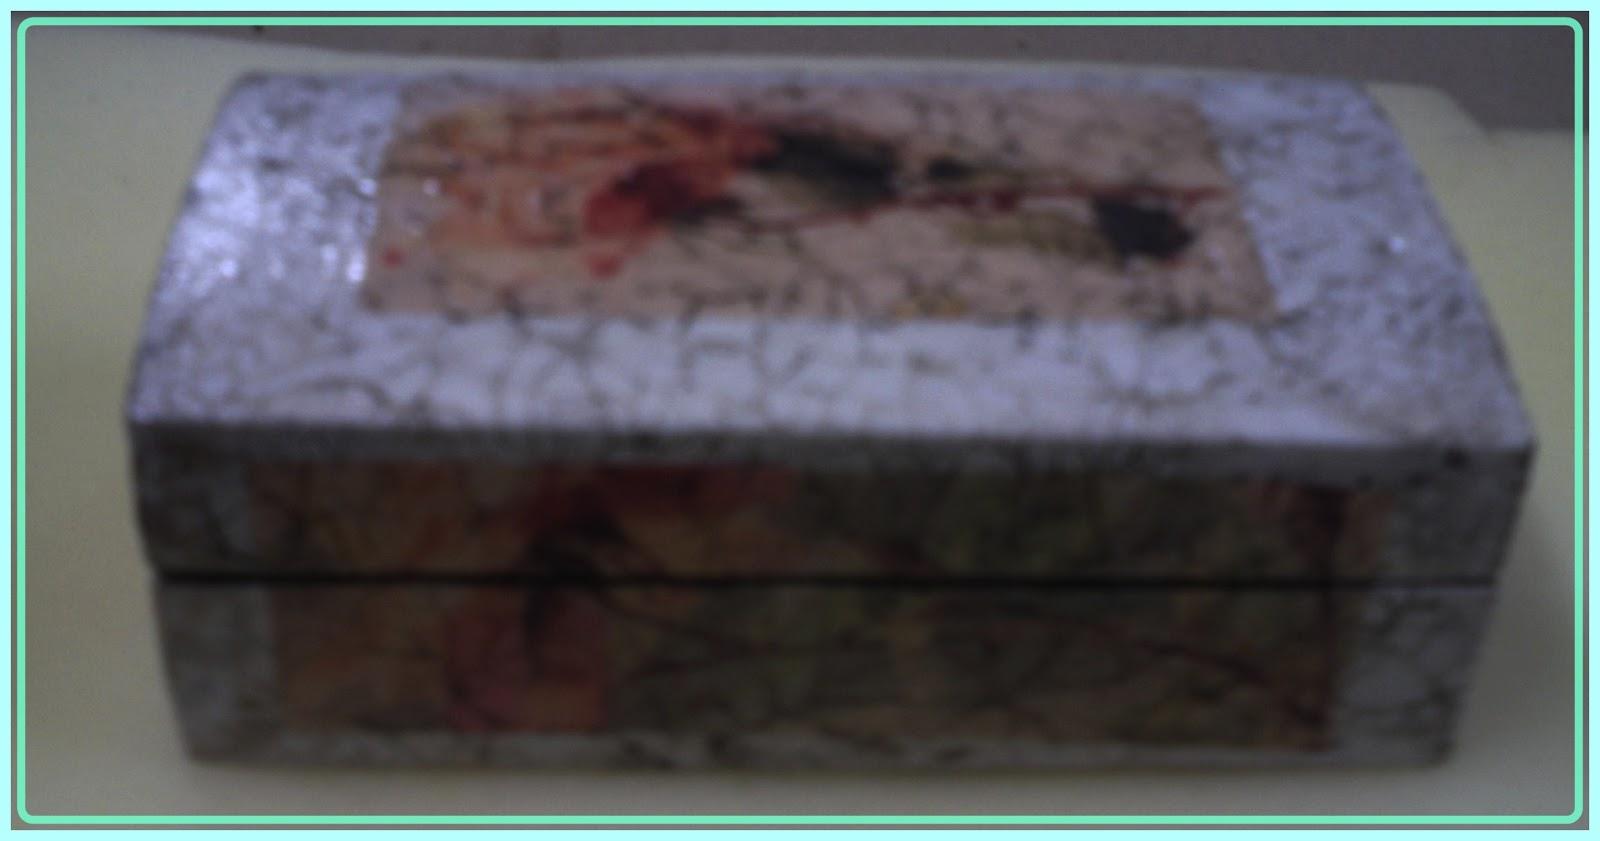 Simplemente manualidades caja de madera craquelada - Manualidades cajas de madera ...